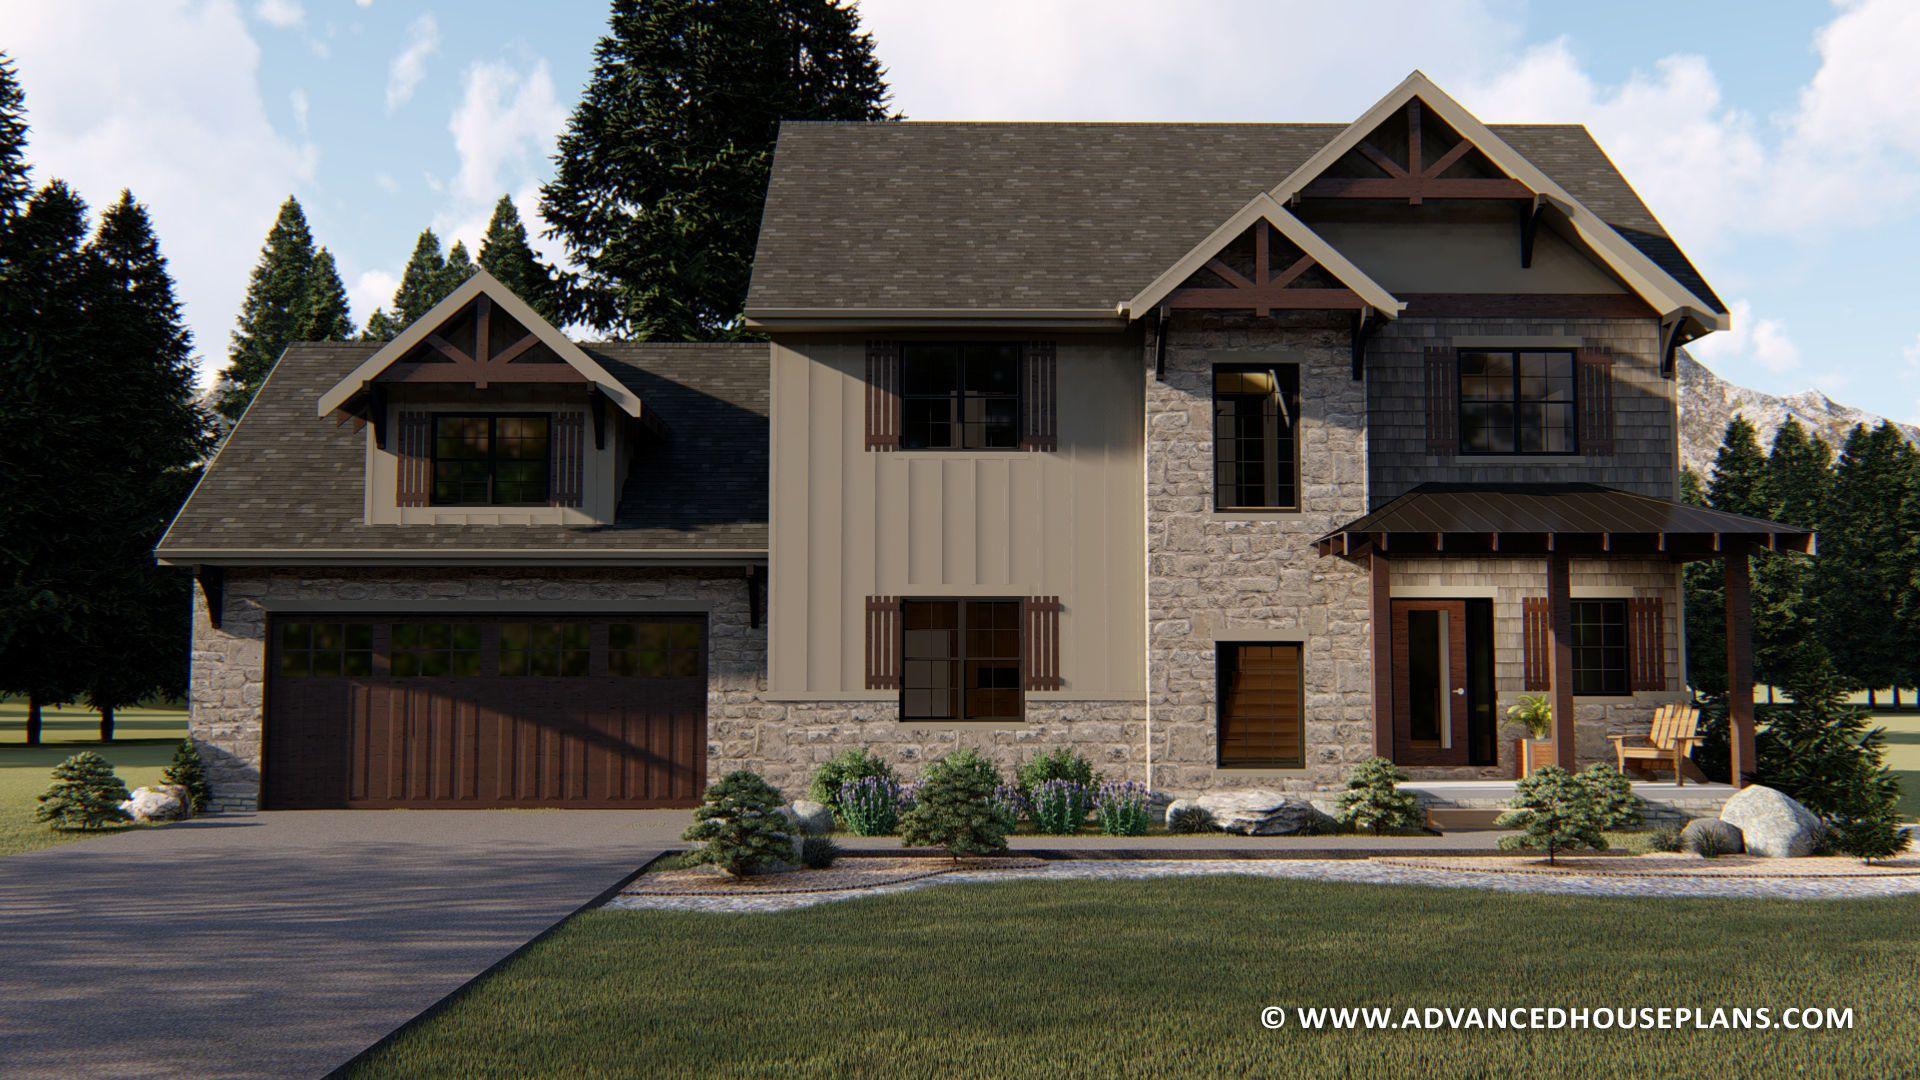 2 Story Craftsman Aspen Rustic House Plans House Plans Rustic House